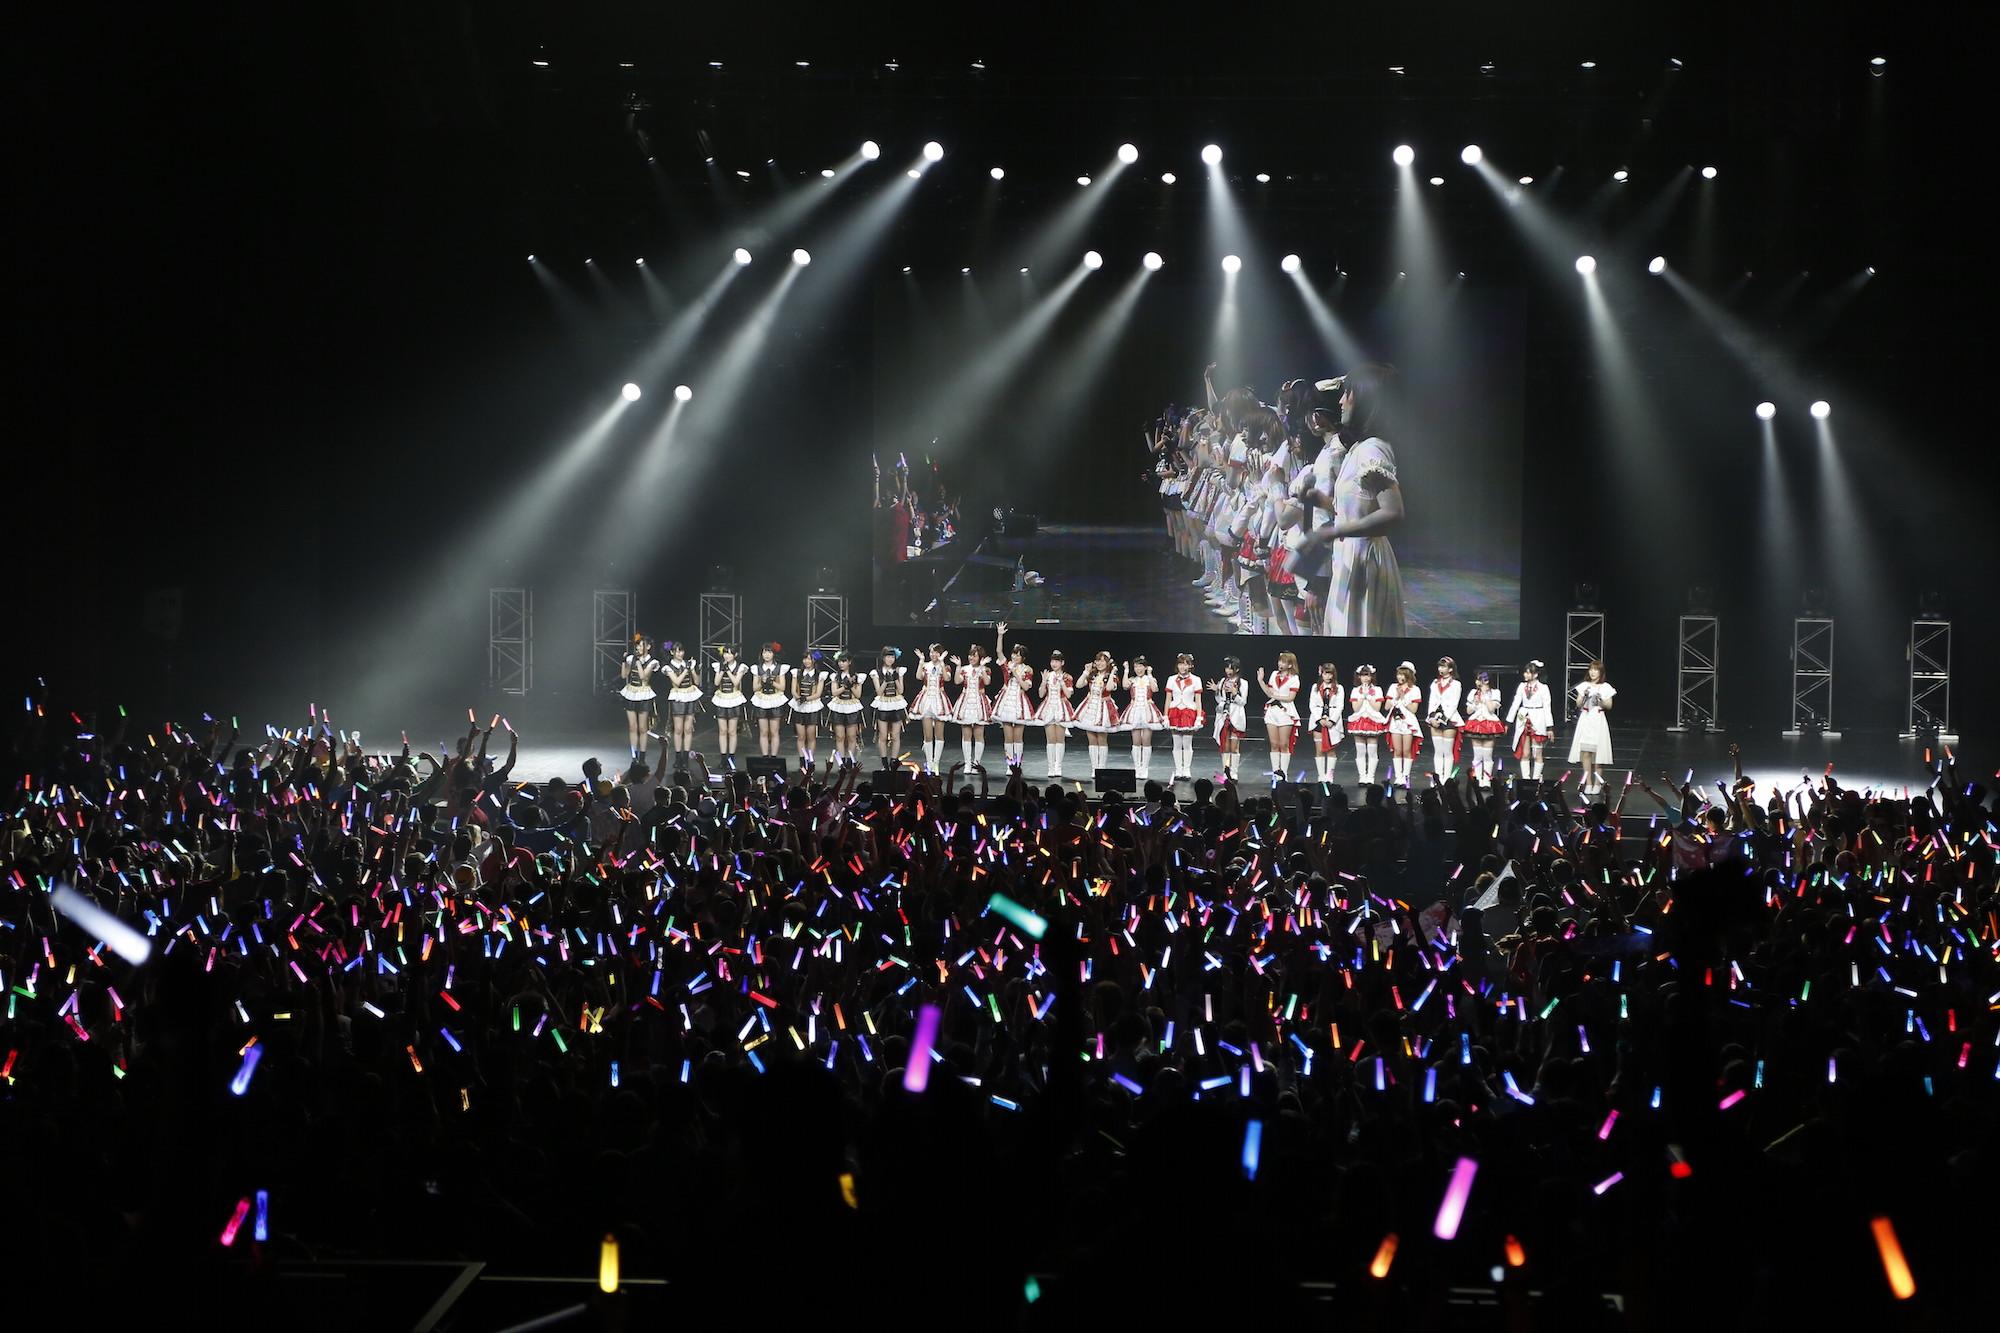 RMMS-AWMAX17-All-Japan-Kawaii-Live-2017-06-30-6752